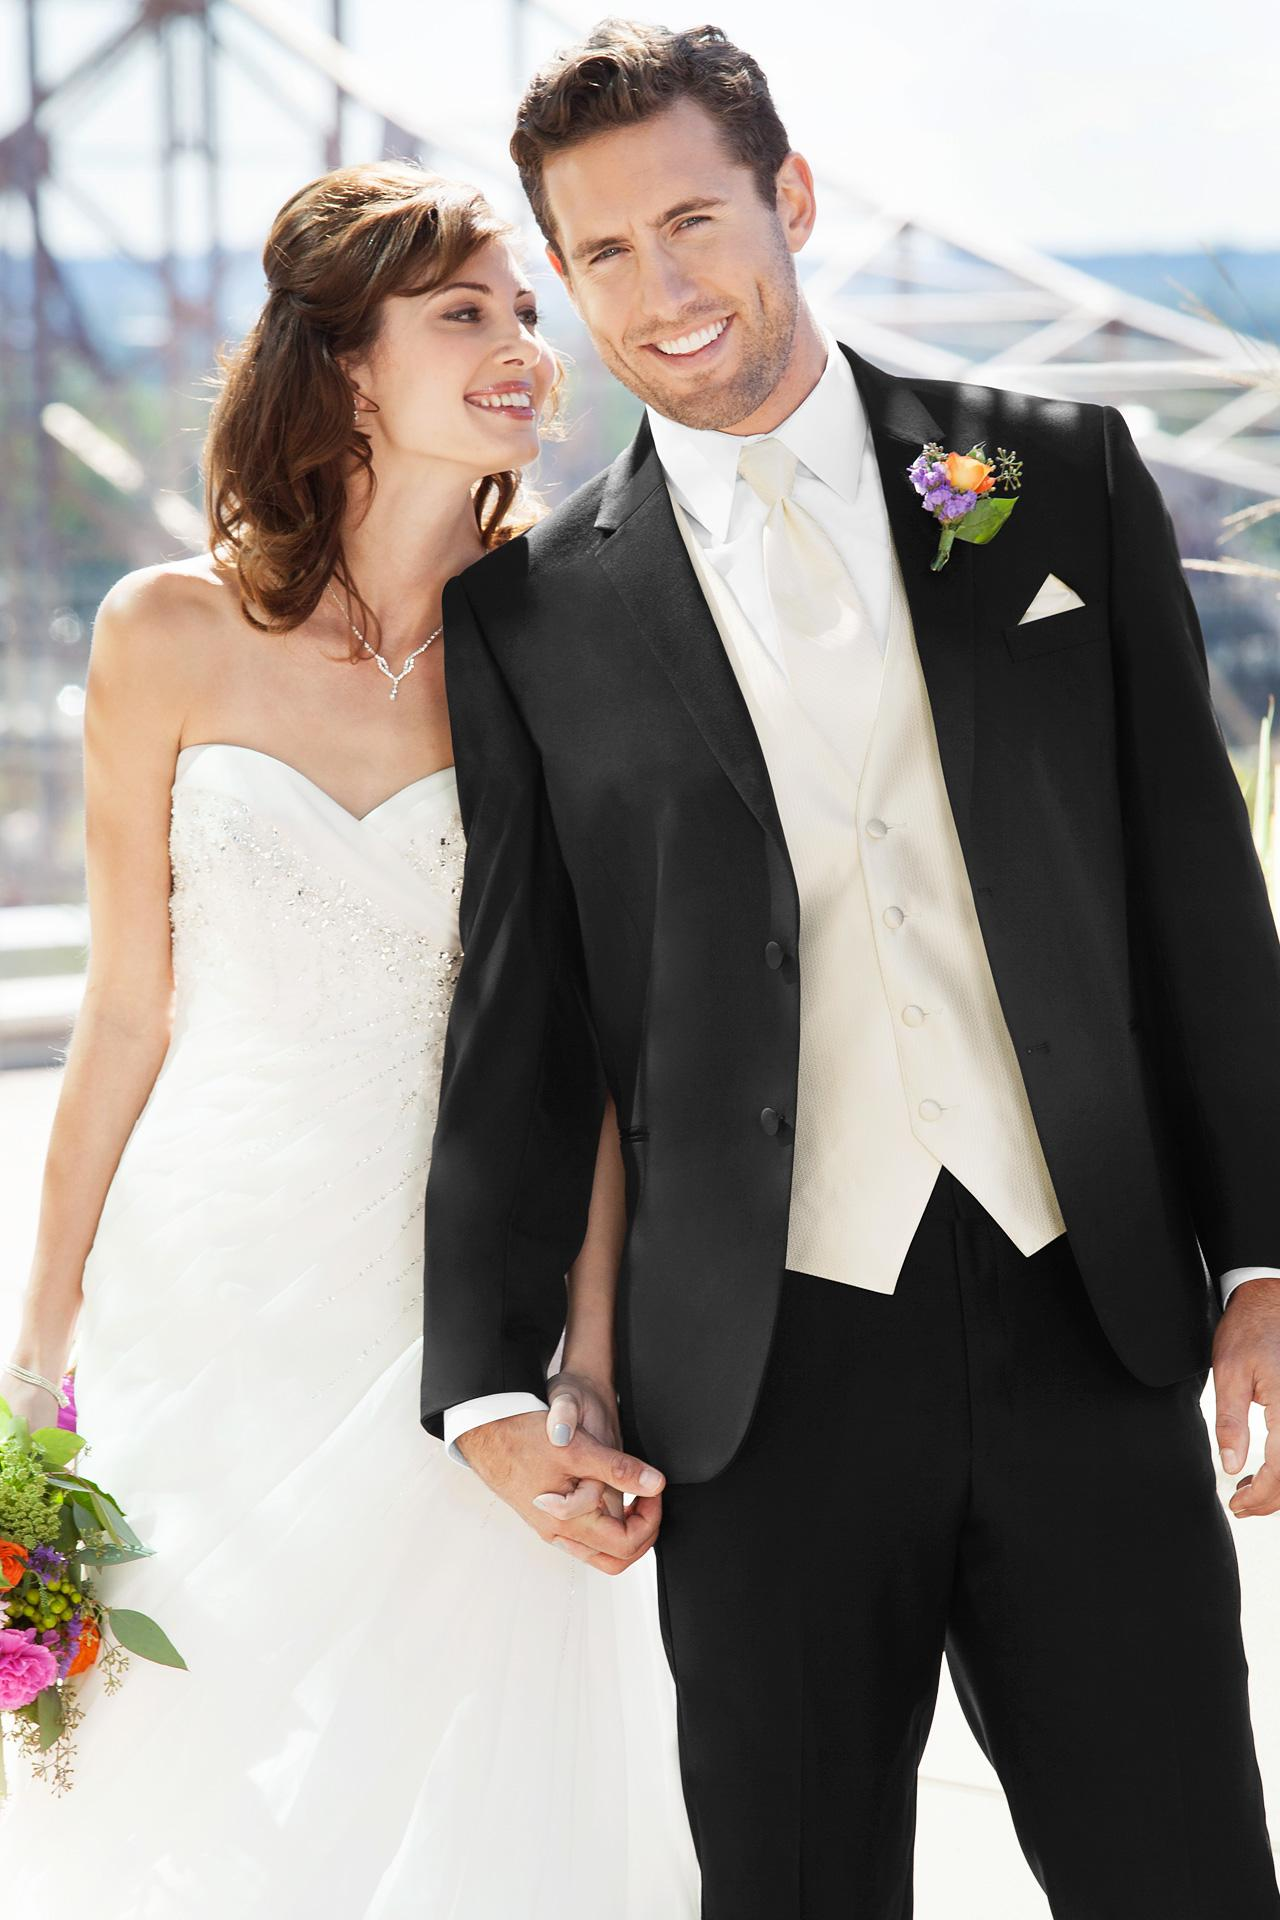 wedding-tuxedo-black-tony-bowls-manhattan-930-4.jpg